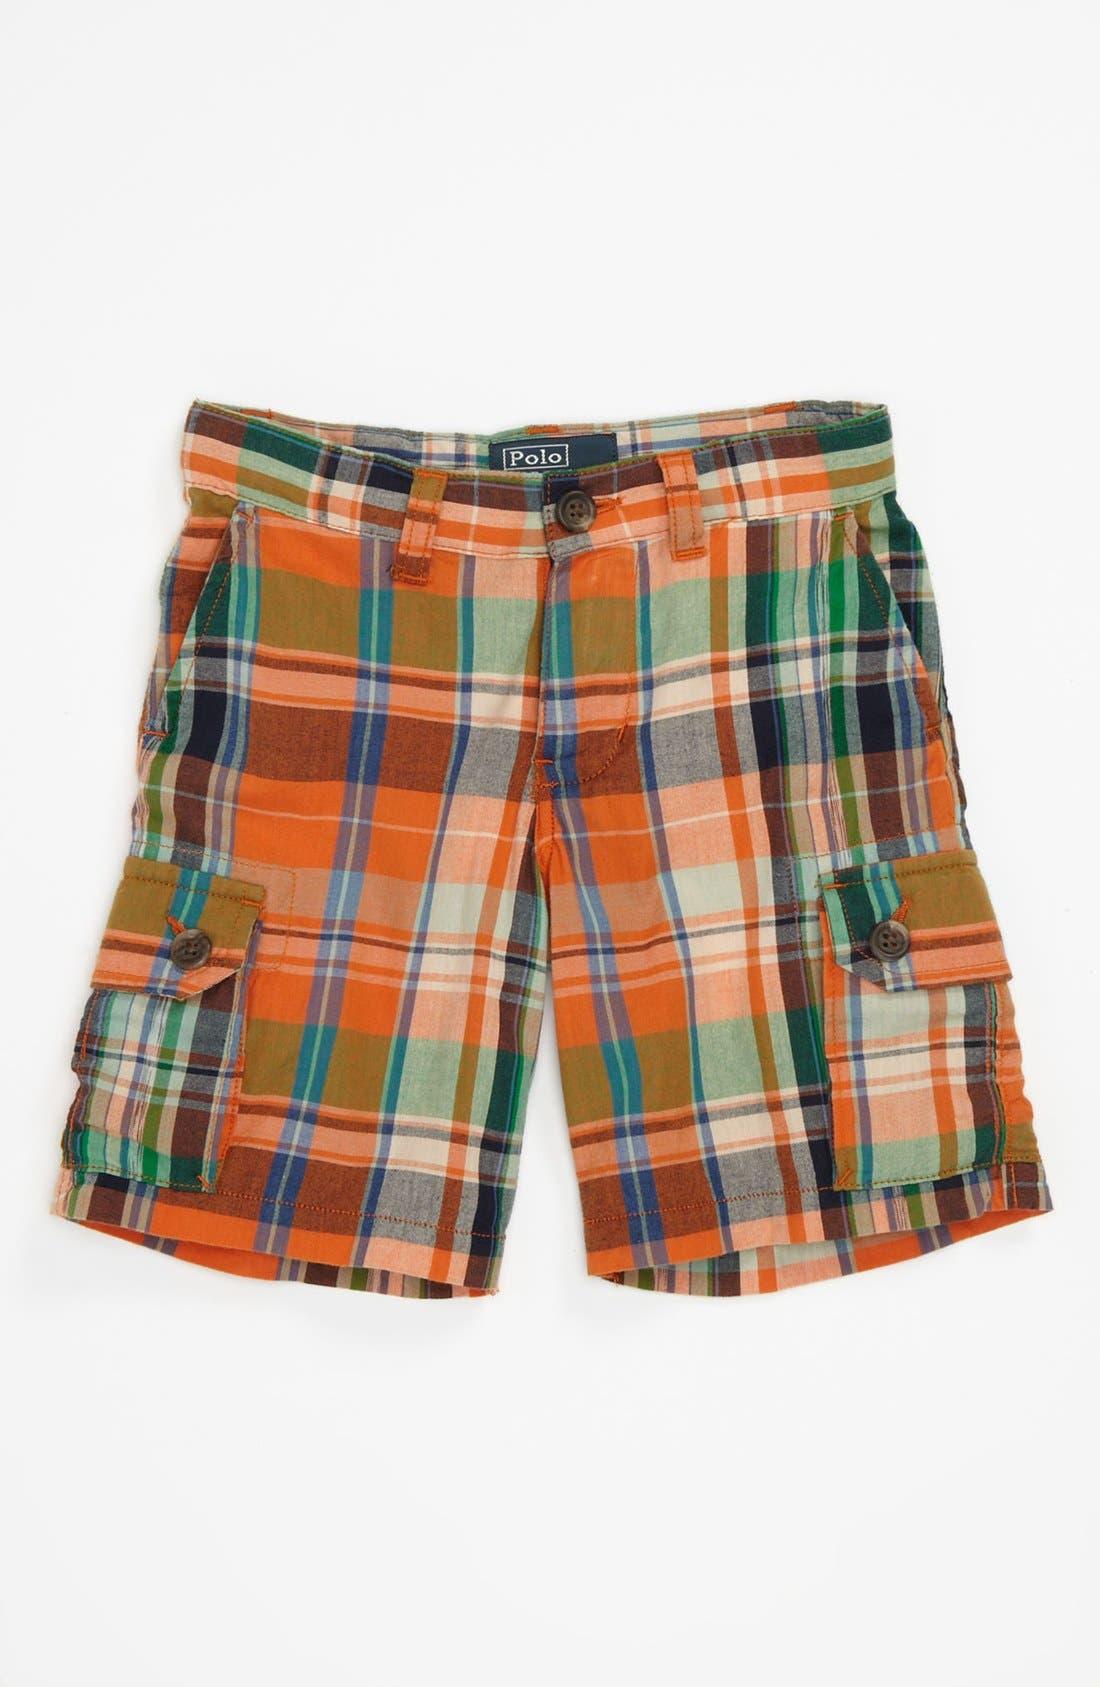 Alternate Image 1 Selected - Ralph Lauren Plaid Shorts (Toddler)